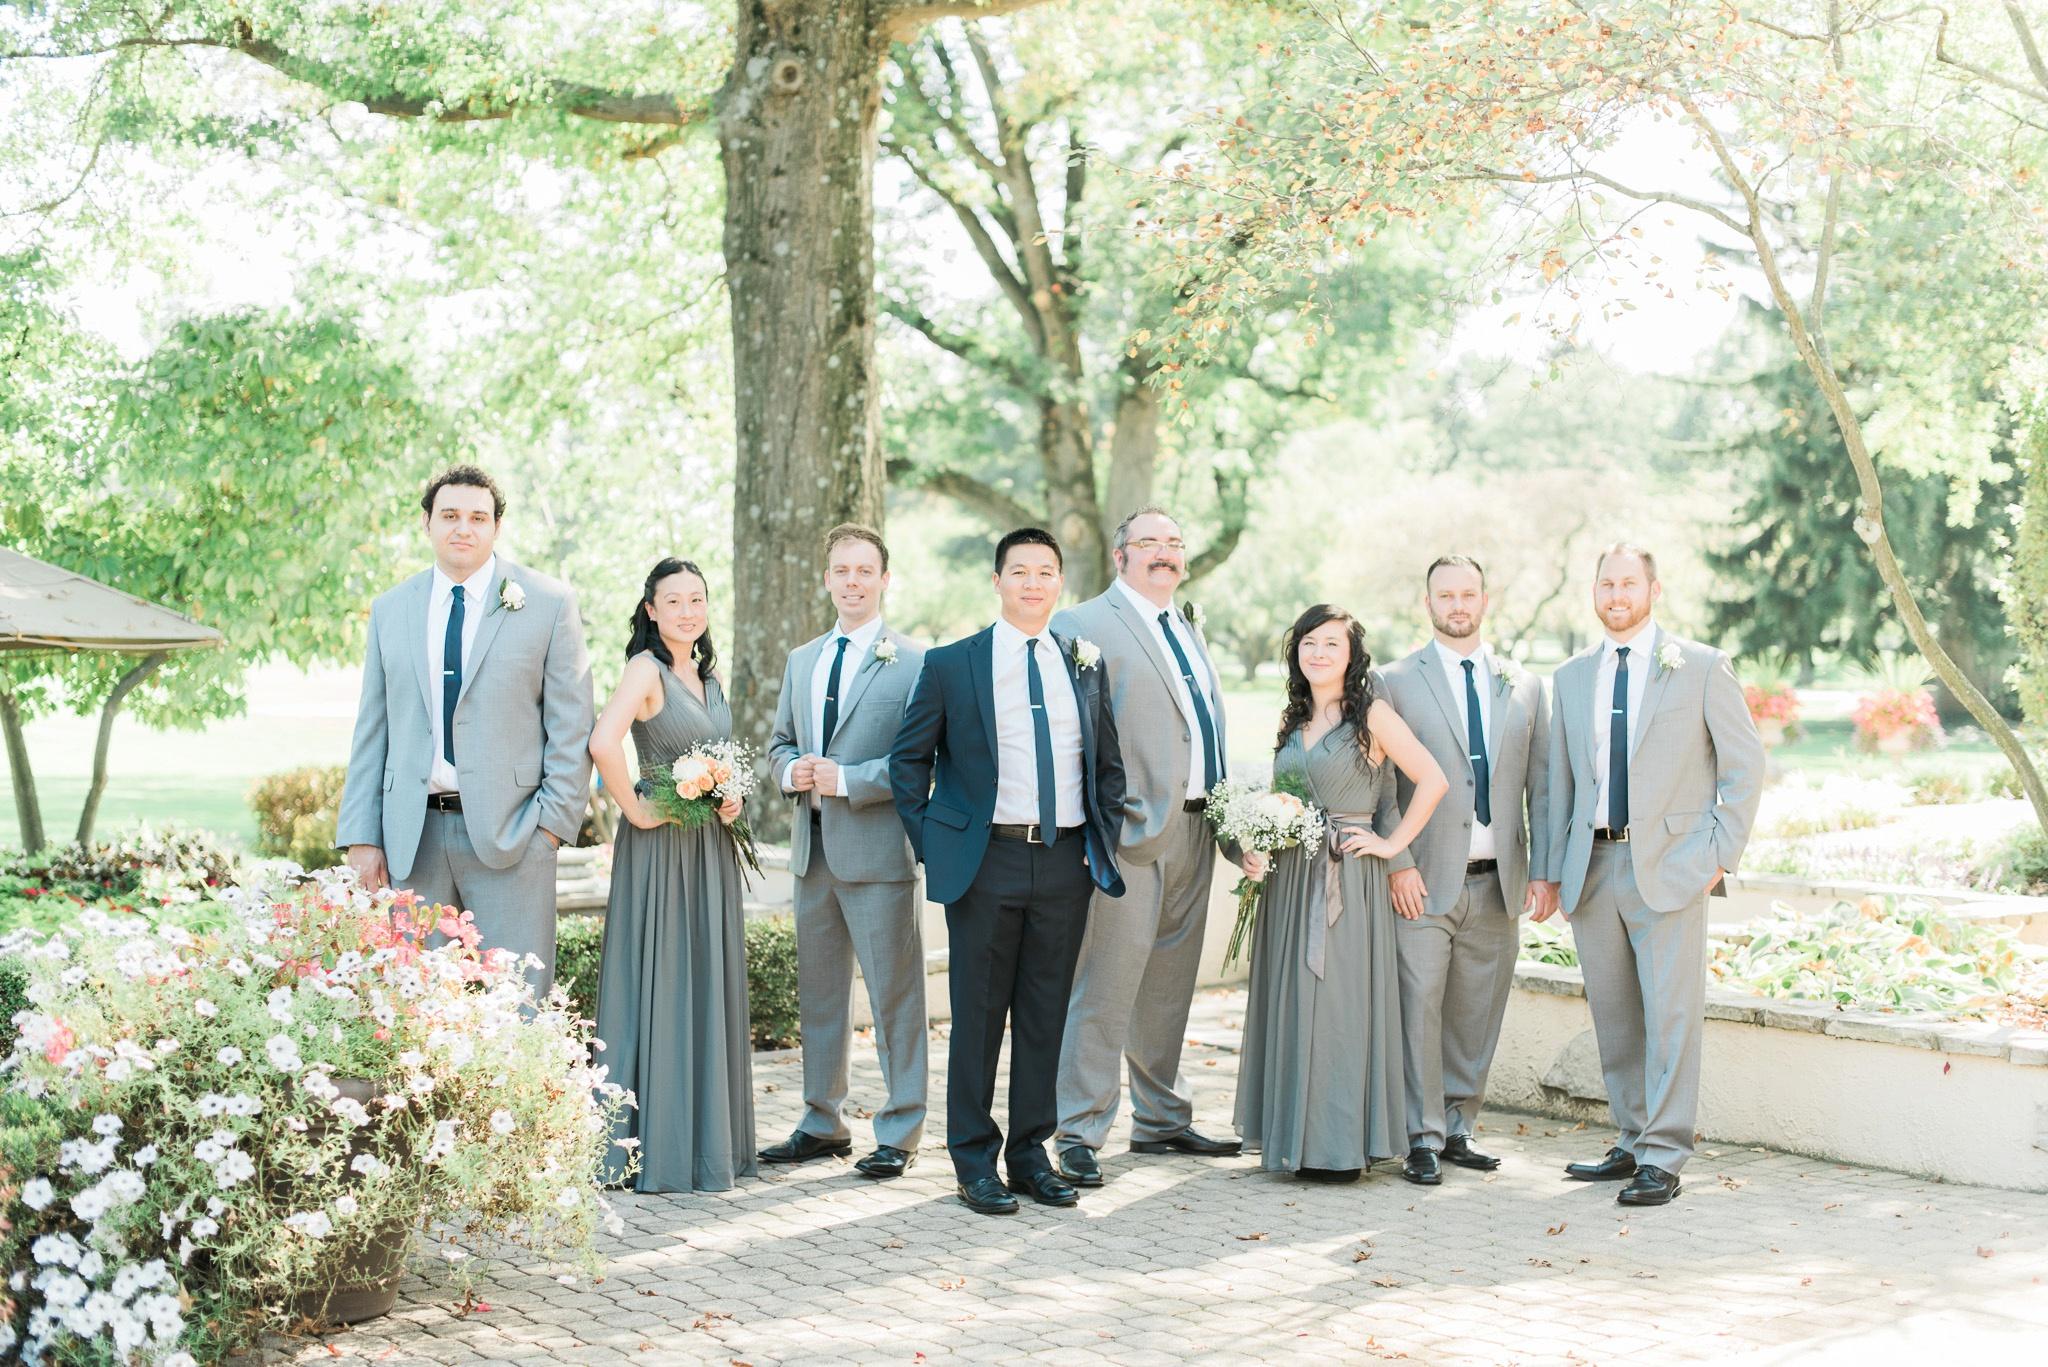 brookside-golf-country-club-wedding-columbus-ohio-36.jpg